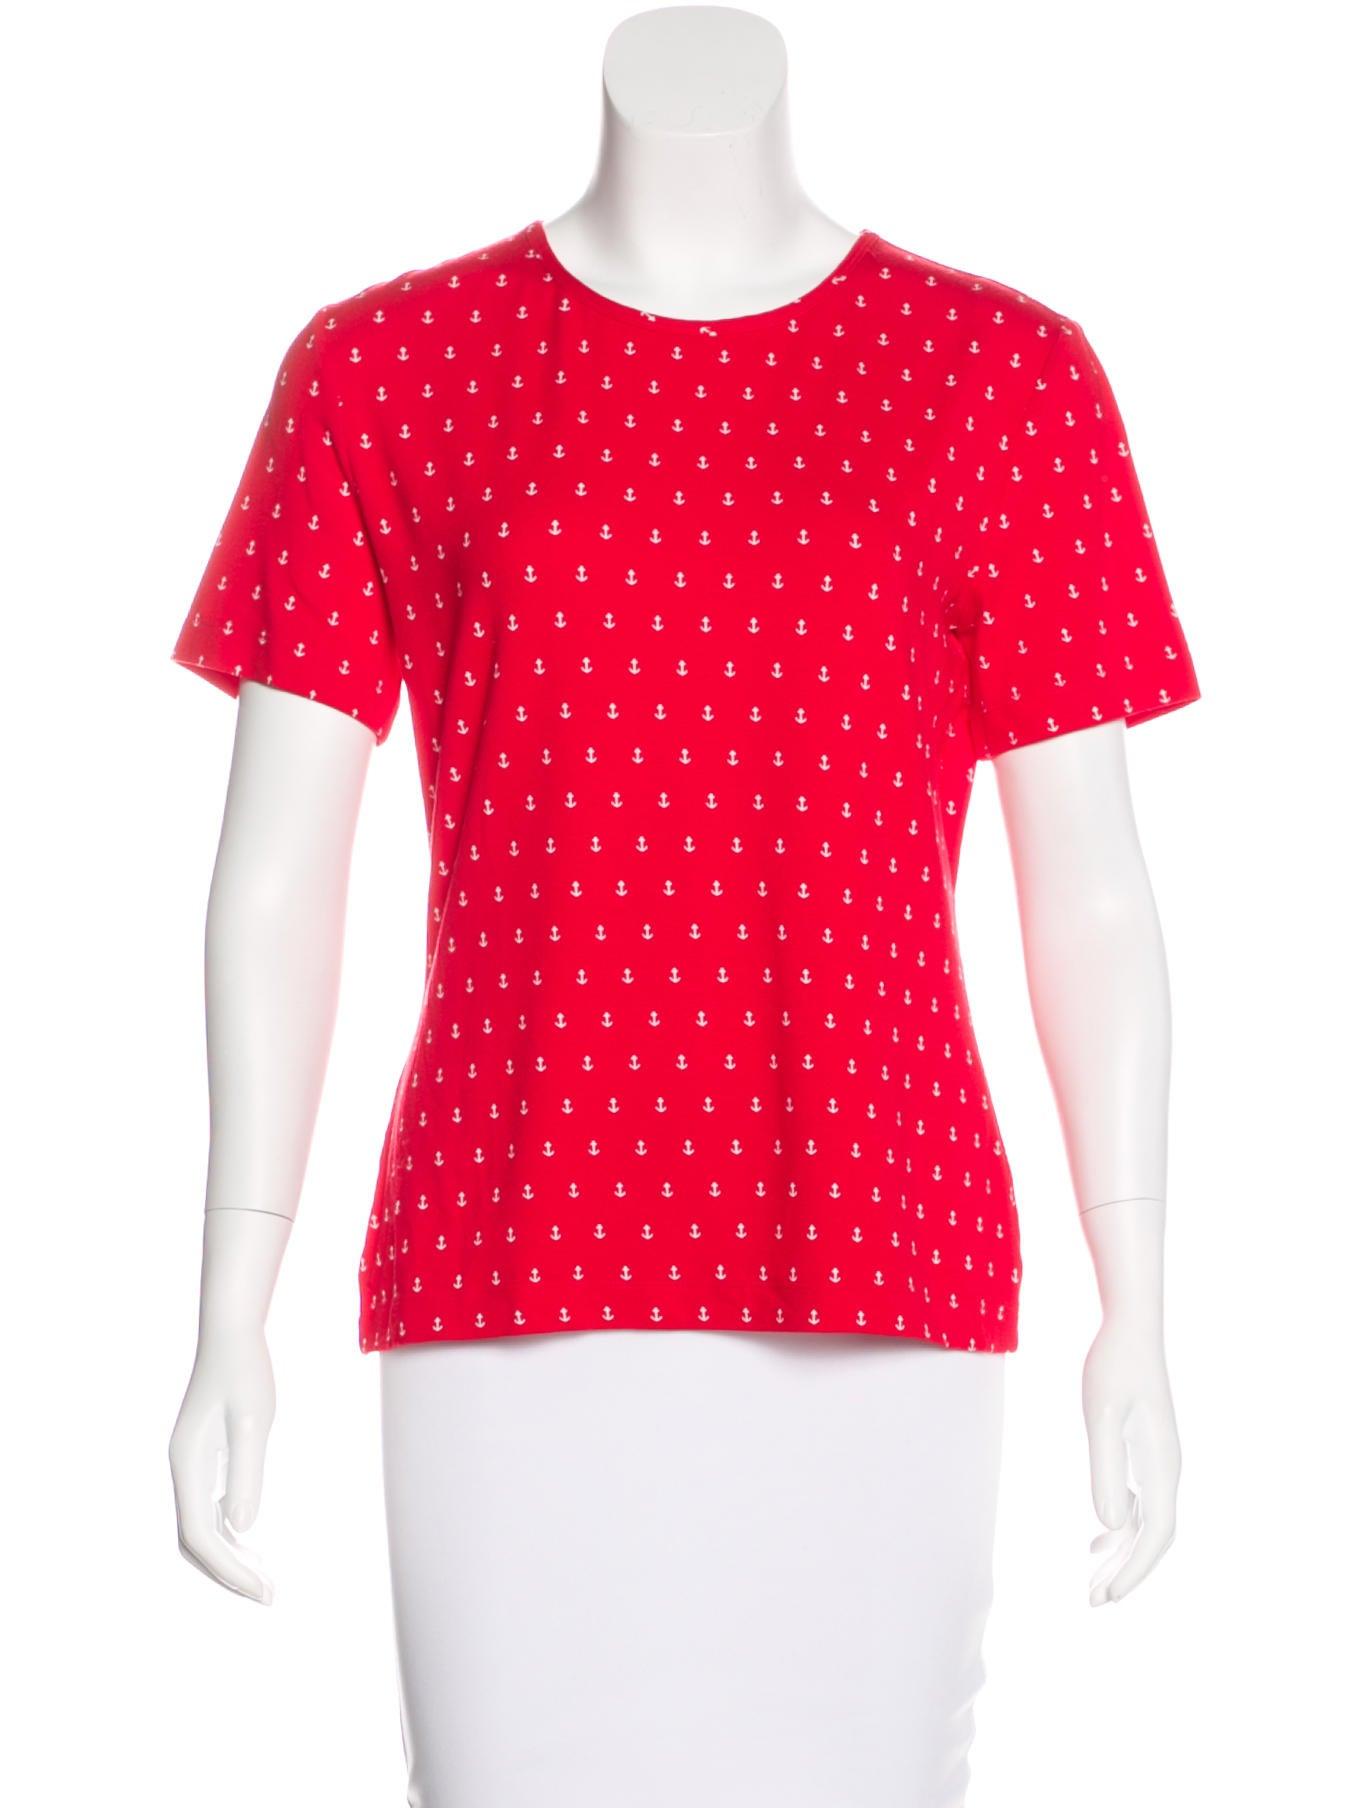 St John Sport Short Sleeve Printed T Shirt Clothing